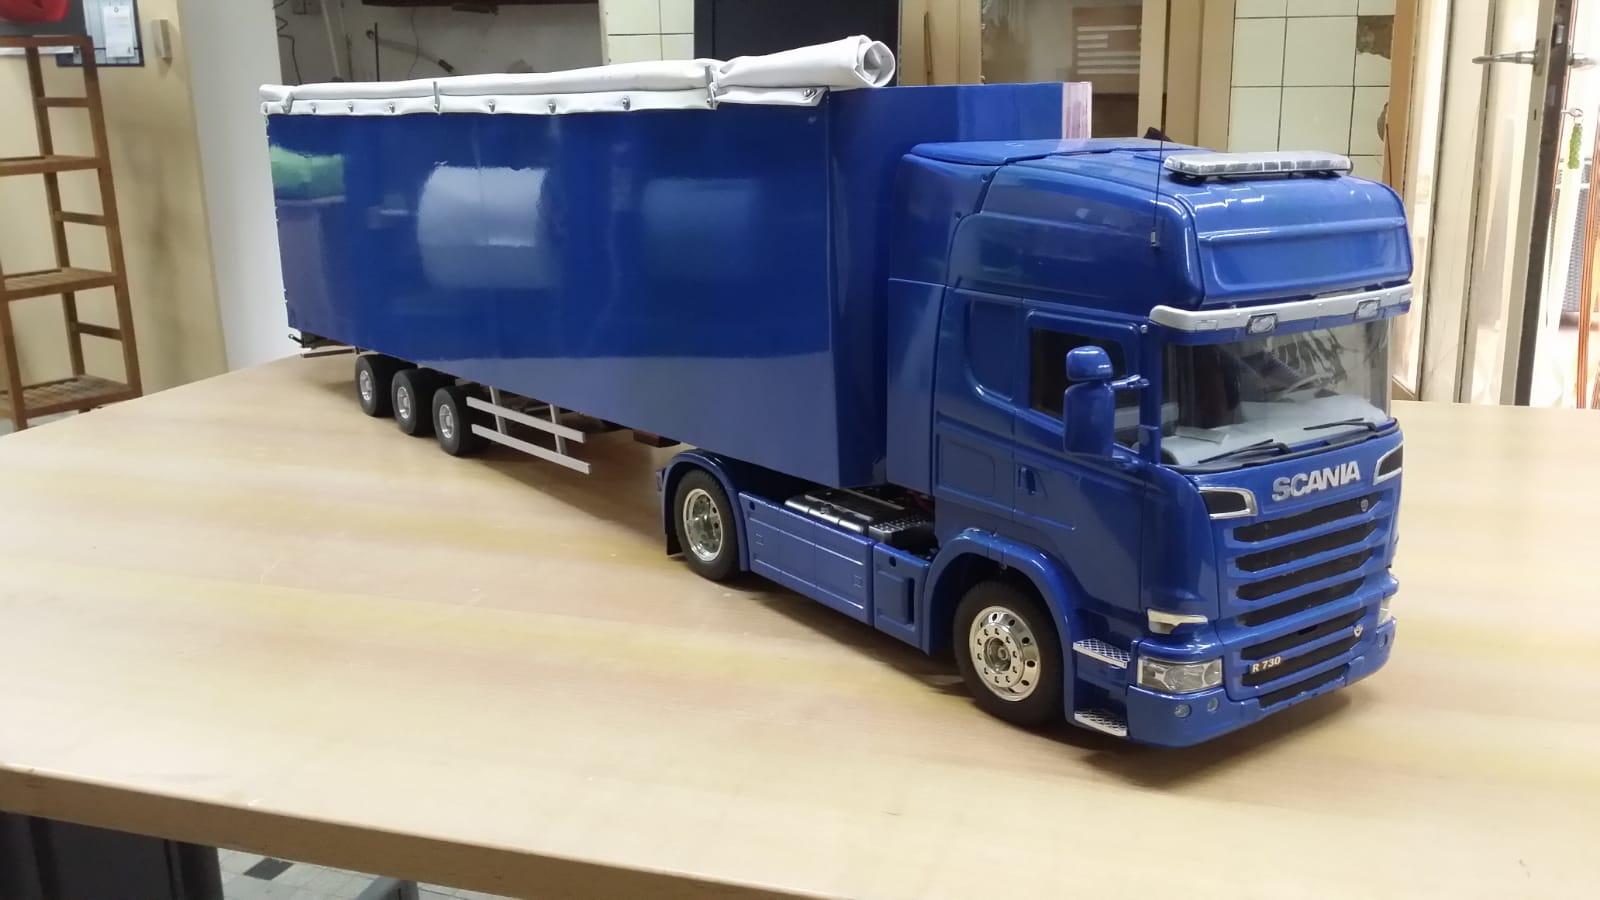 Scania Streamline R730 (verkerk front en walking floor trailer )